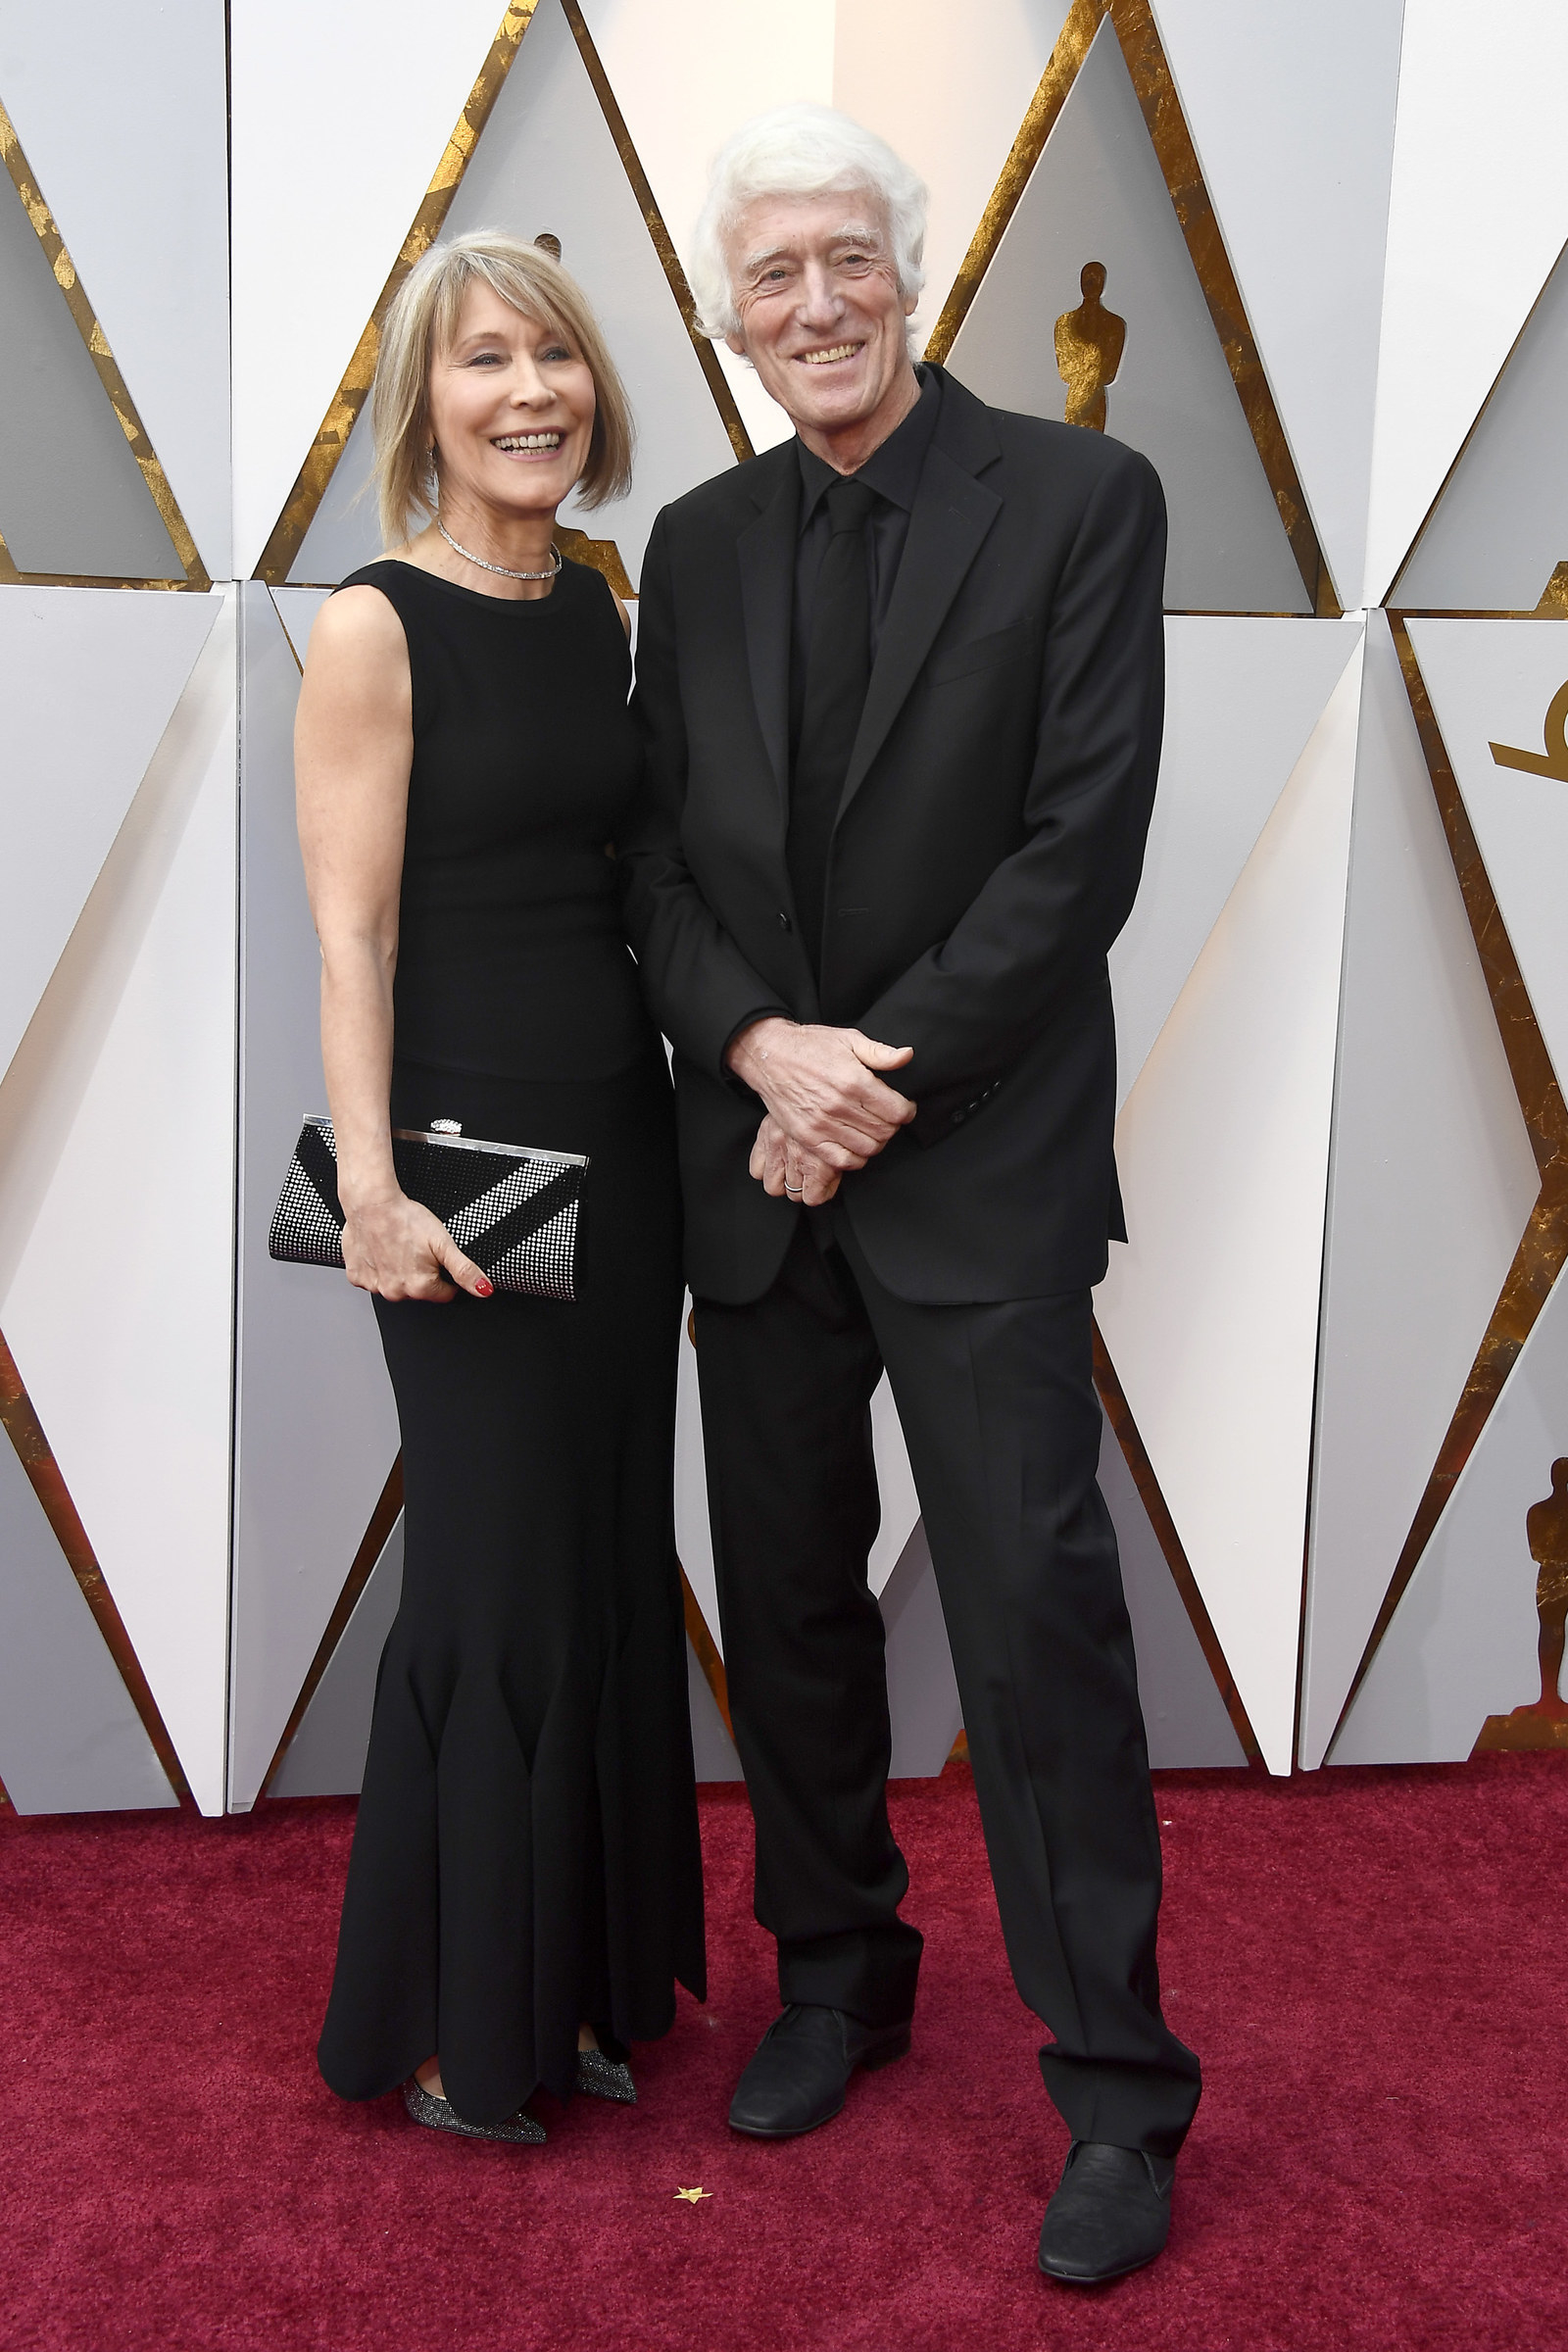 One Of Oscar's Longest Losing Streaks Just Ended